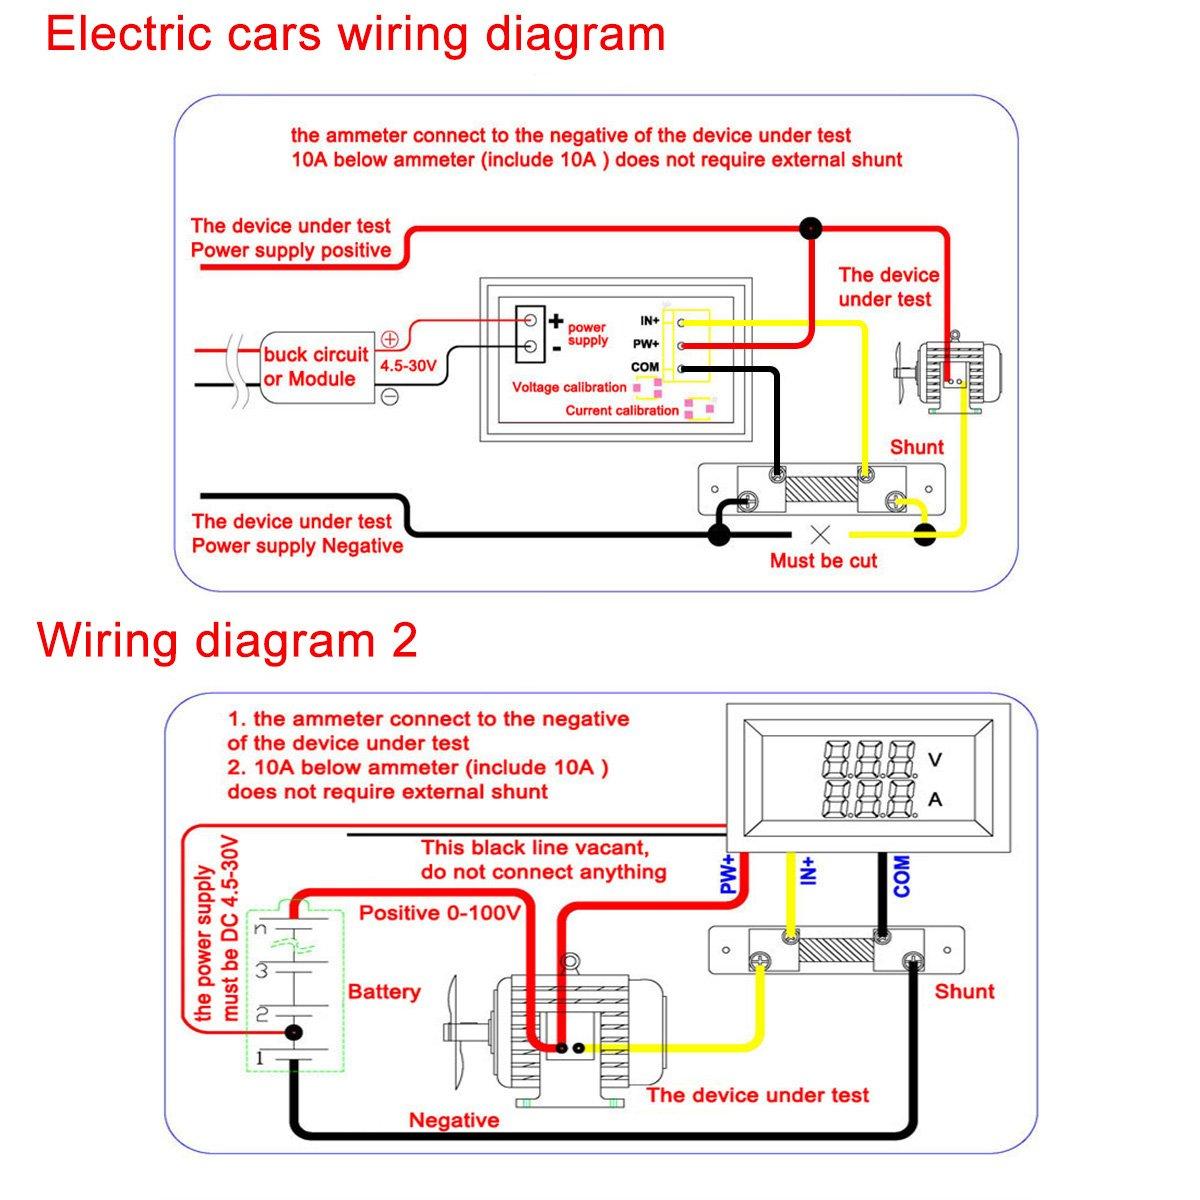 Drok Yb27va10a Digital Voltmeterammeter With Dual Display Dc 0100v10 Generic Wiring Diagram Yb27va 10a Voltmeter Ammeter 0 100v 10 Amp Red Blue